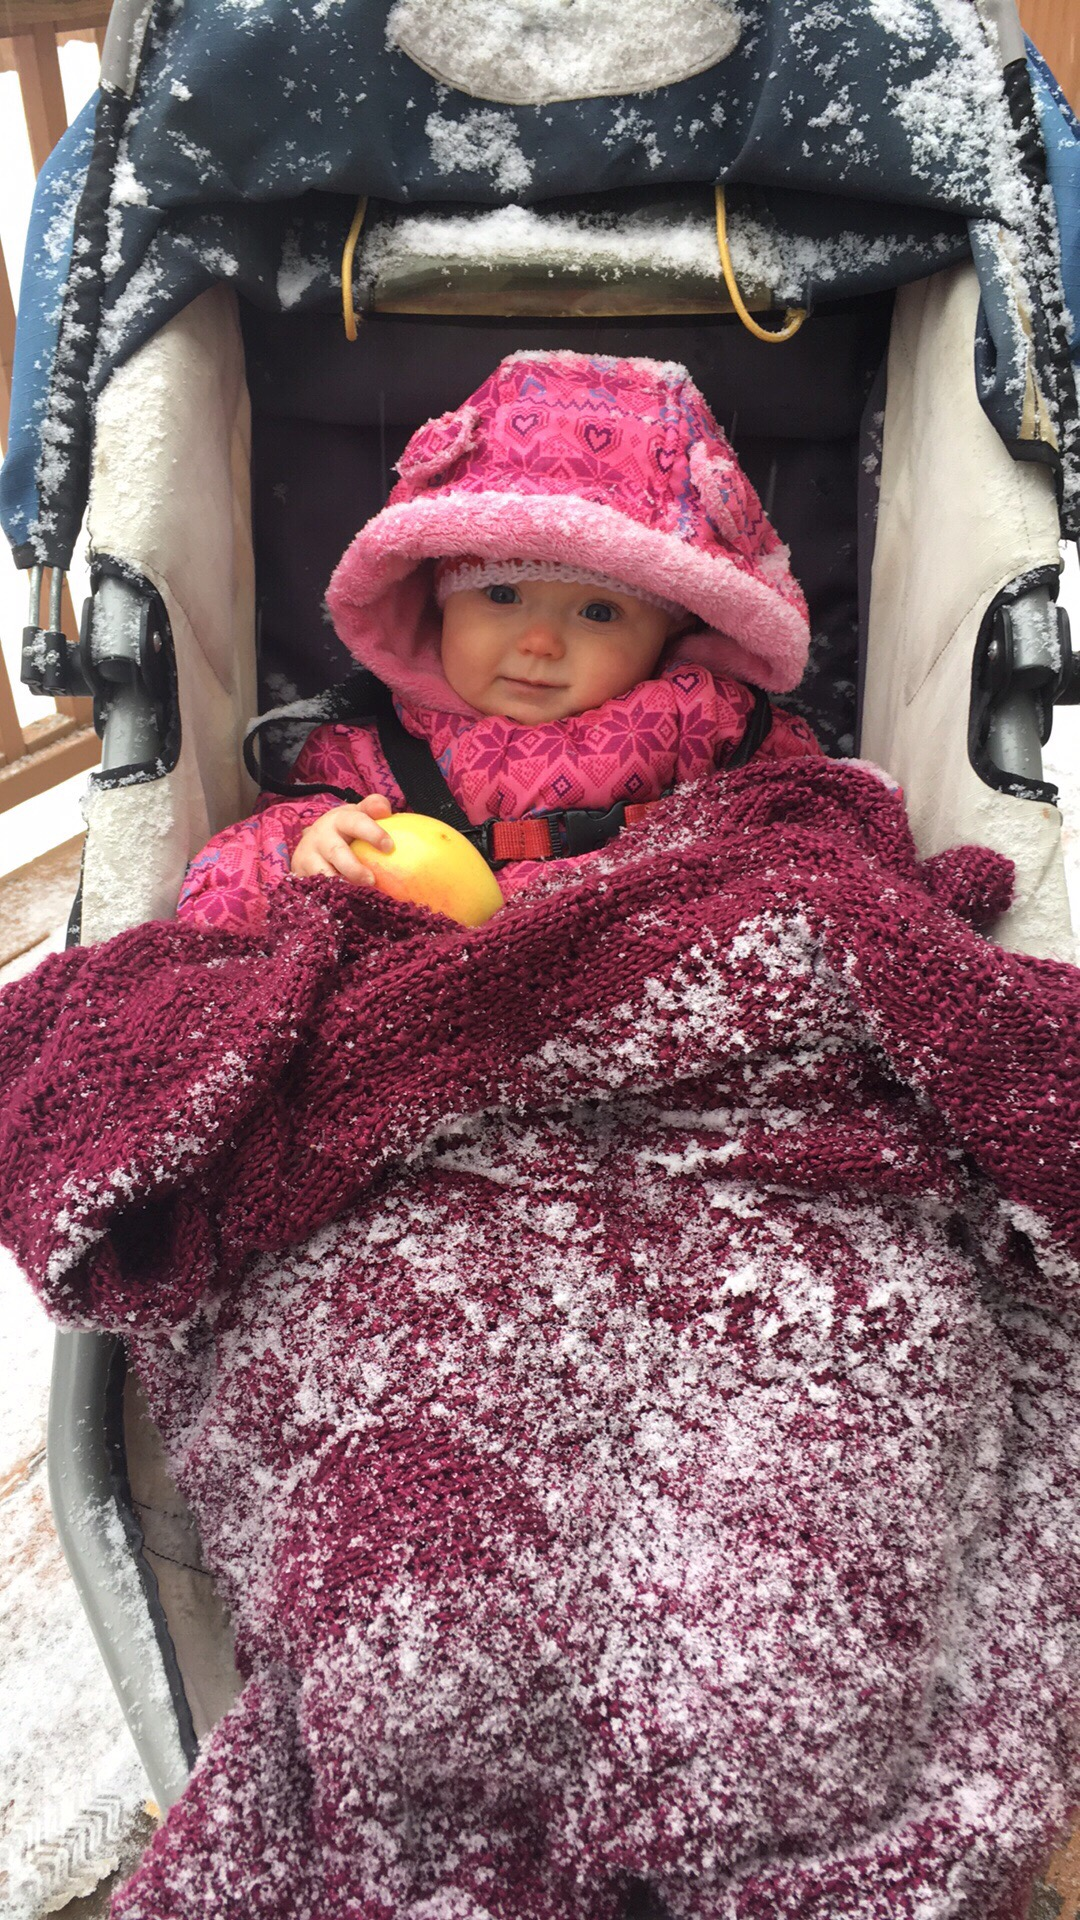 snowy apple snacks